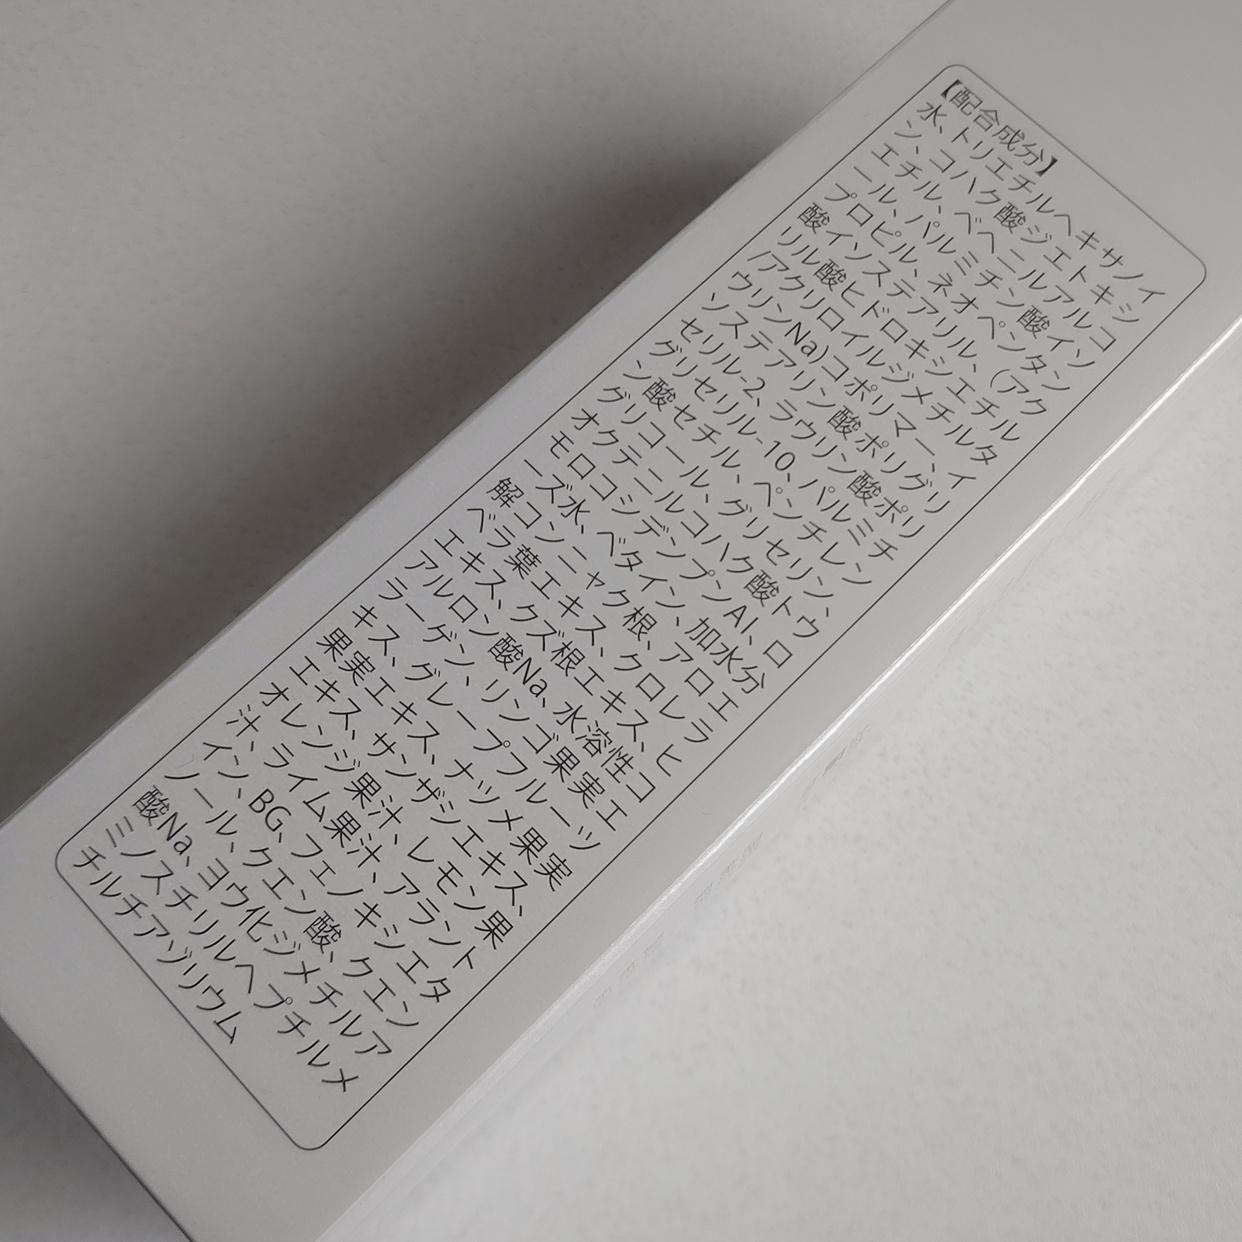 Moonyu(モーニュ) ピュア クレンジング クリームに関するまおぽこさんの口コミ画像3